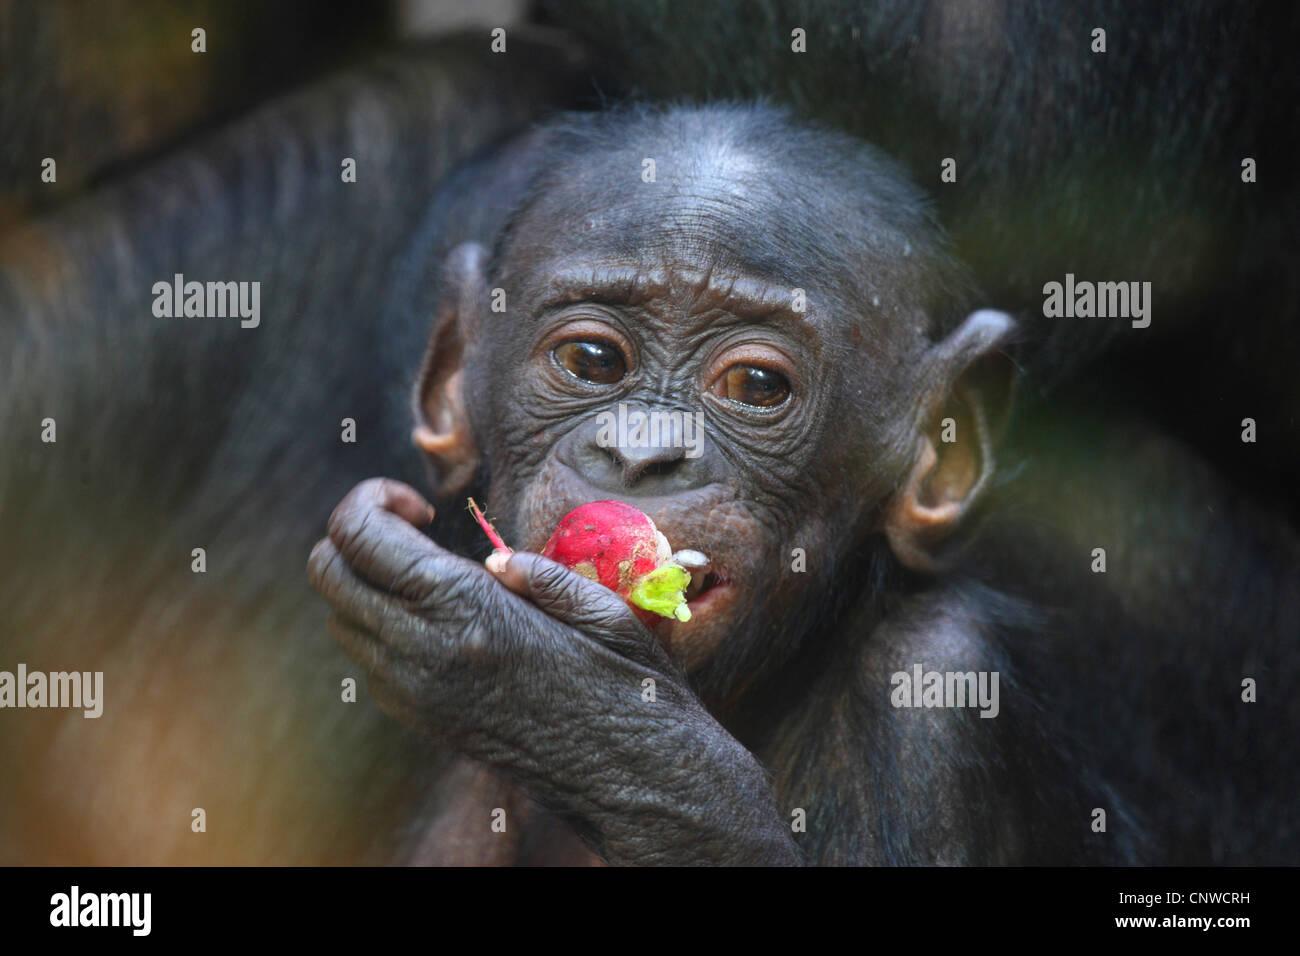 bonobo, pygmy chimpanzee (Pan paniscus), young bonobo eating a red fruit - Stock Image